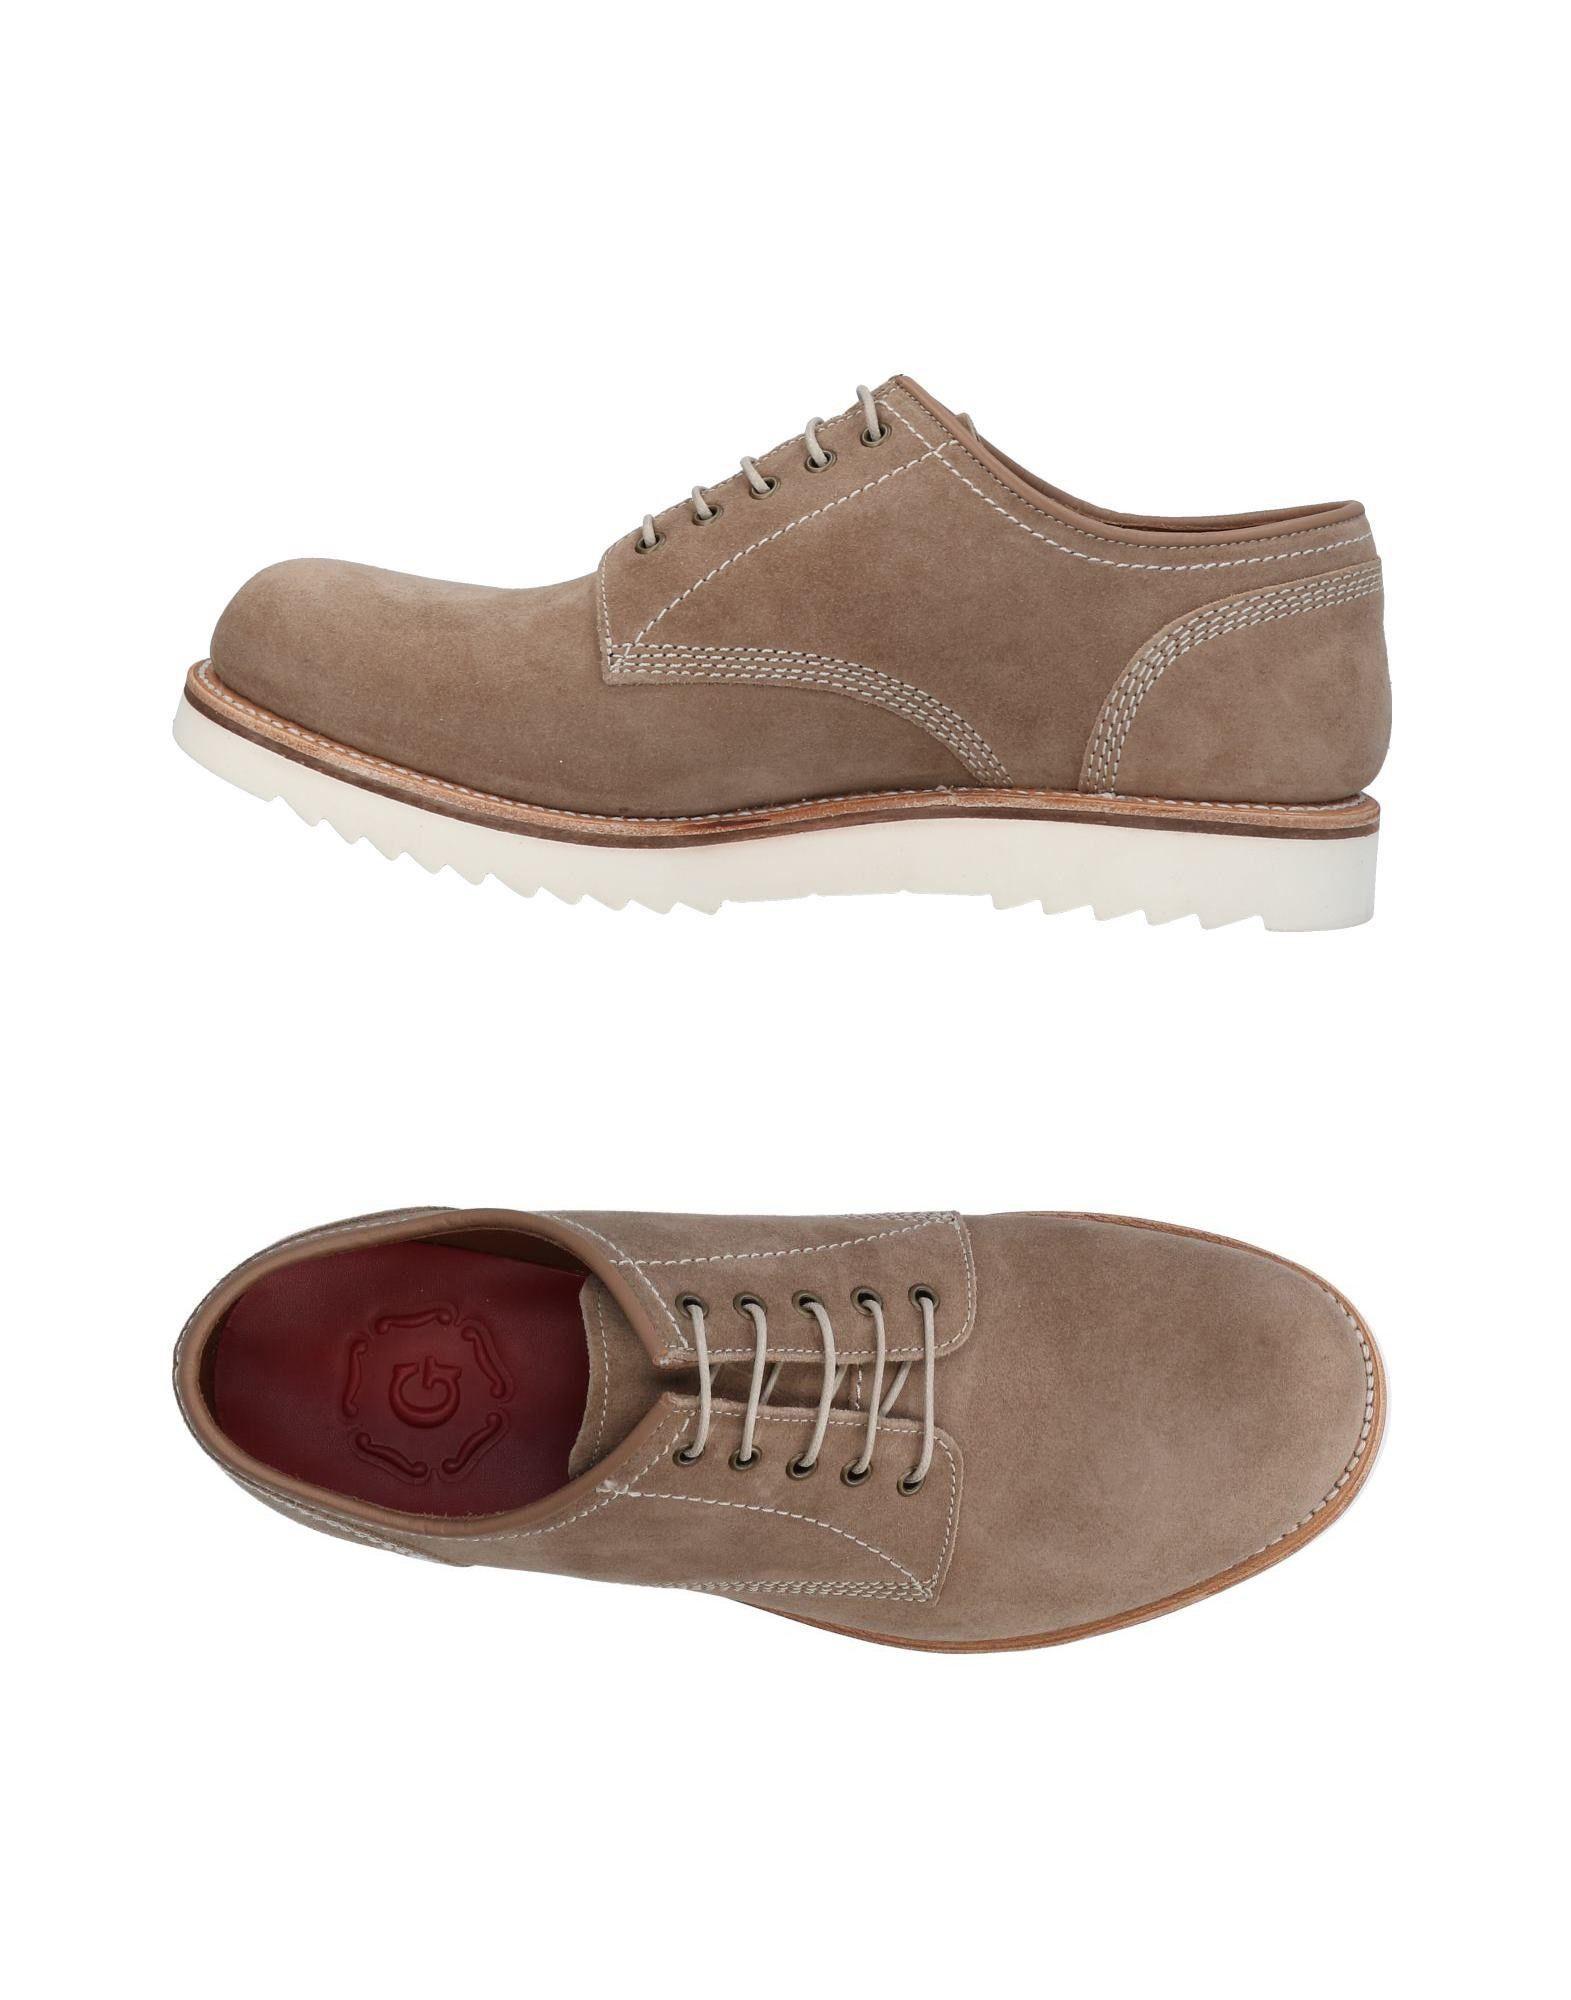 Grenson Schnürschuhe Herren  11454077KA Gute Qualität beliebte Schuhe